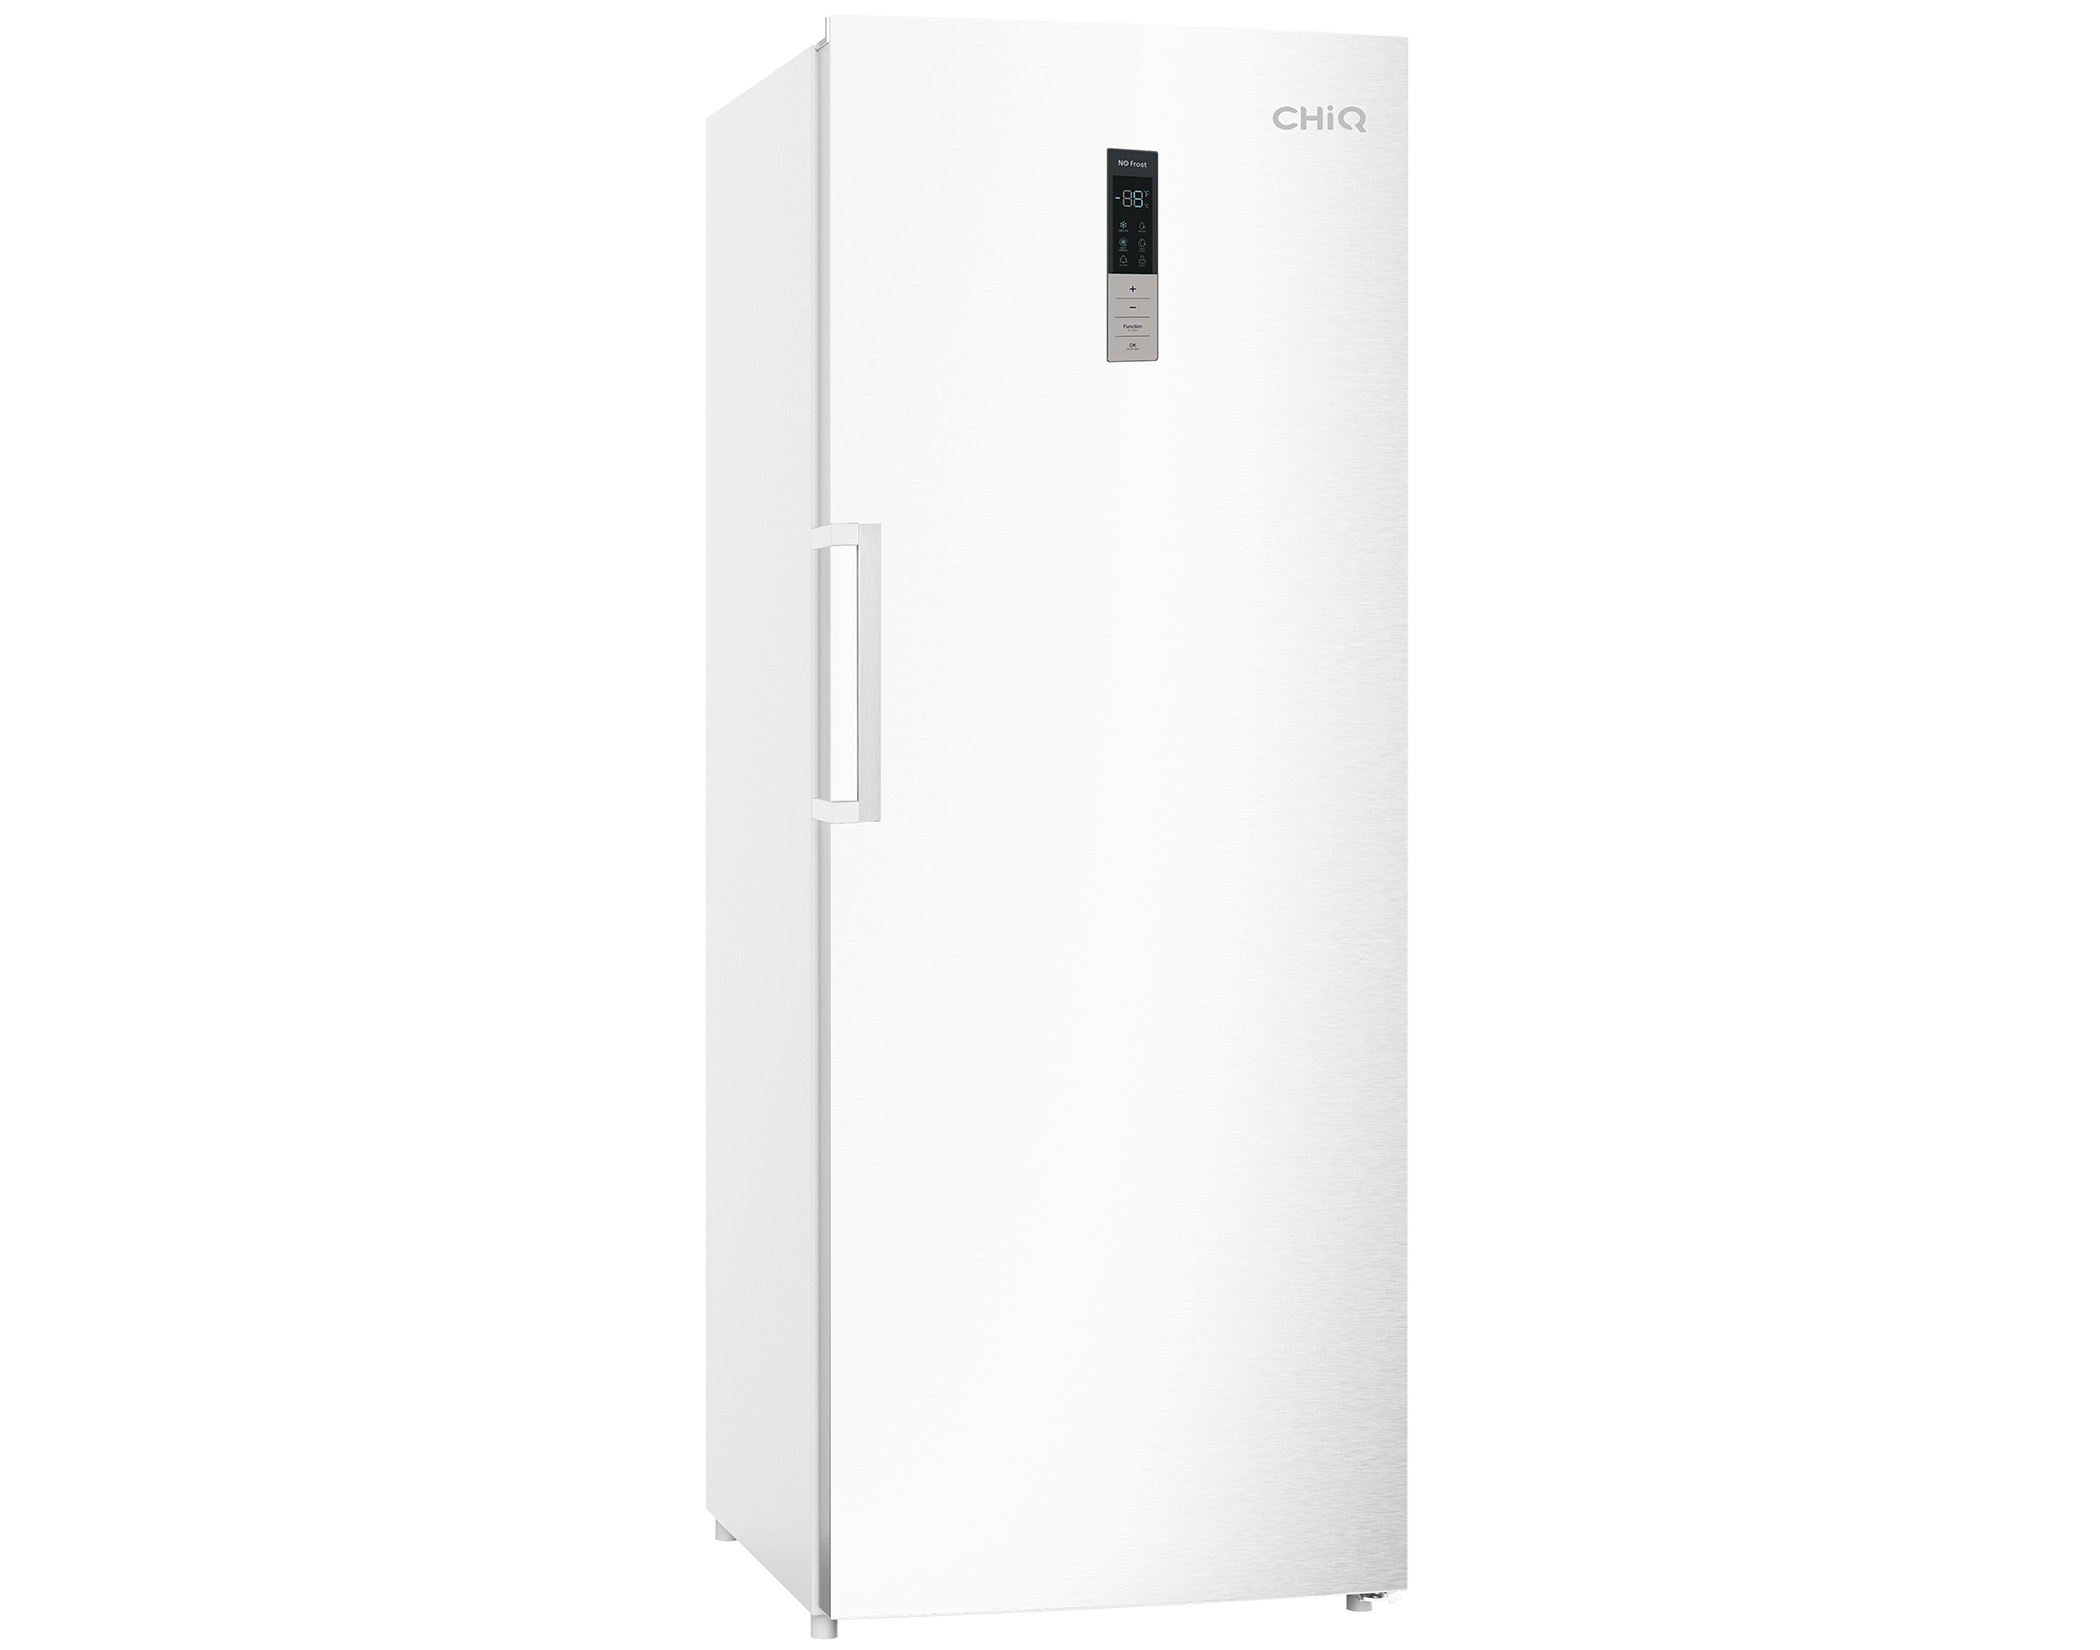 Chiq CSH431WR 431L Frost Free Hybrid Fridge Freezer in White main